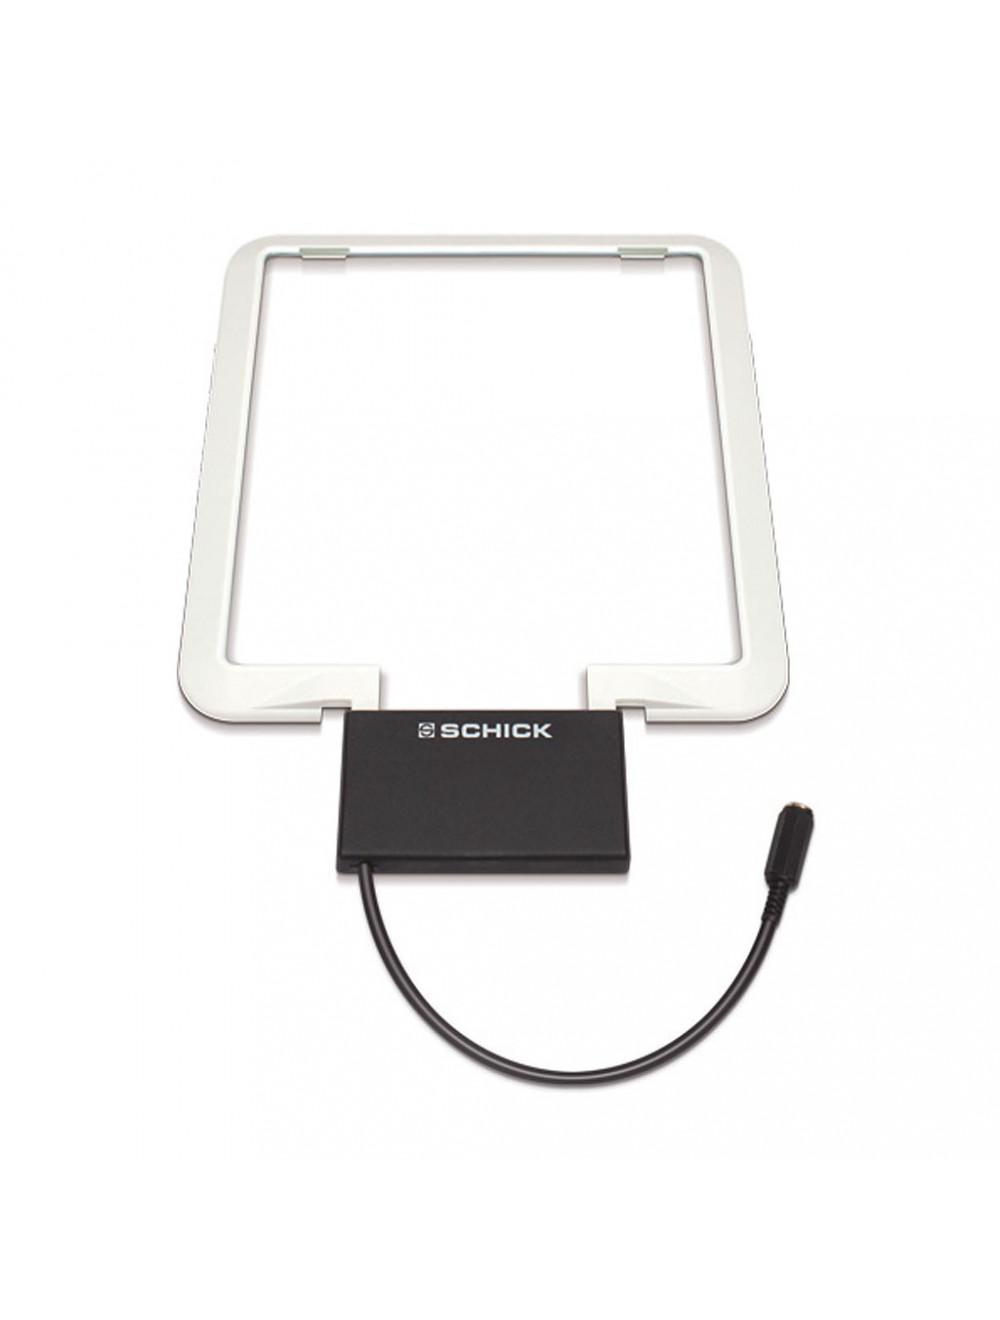 Schick L Protect LED-beleuchtete Schutzscheibe 4460